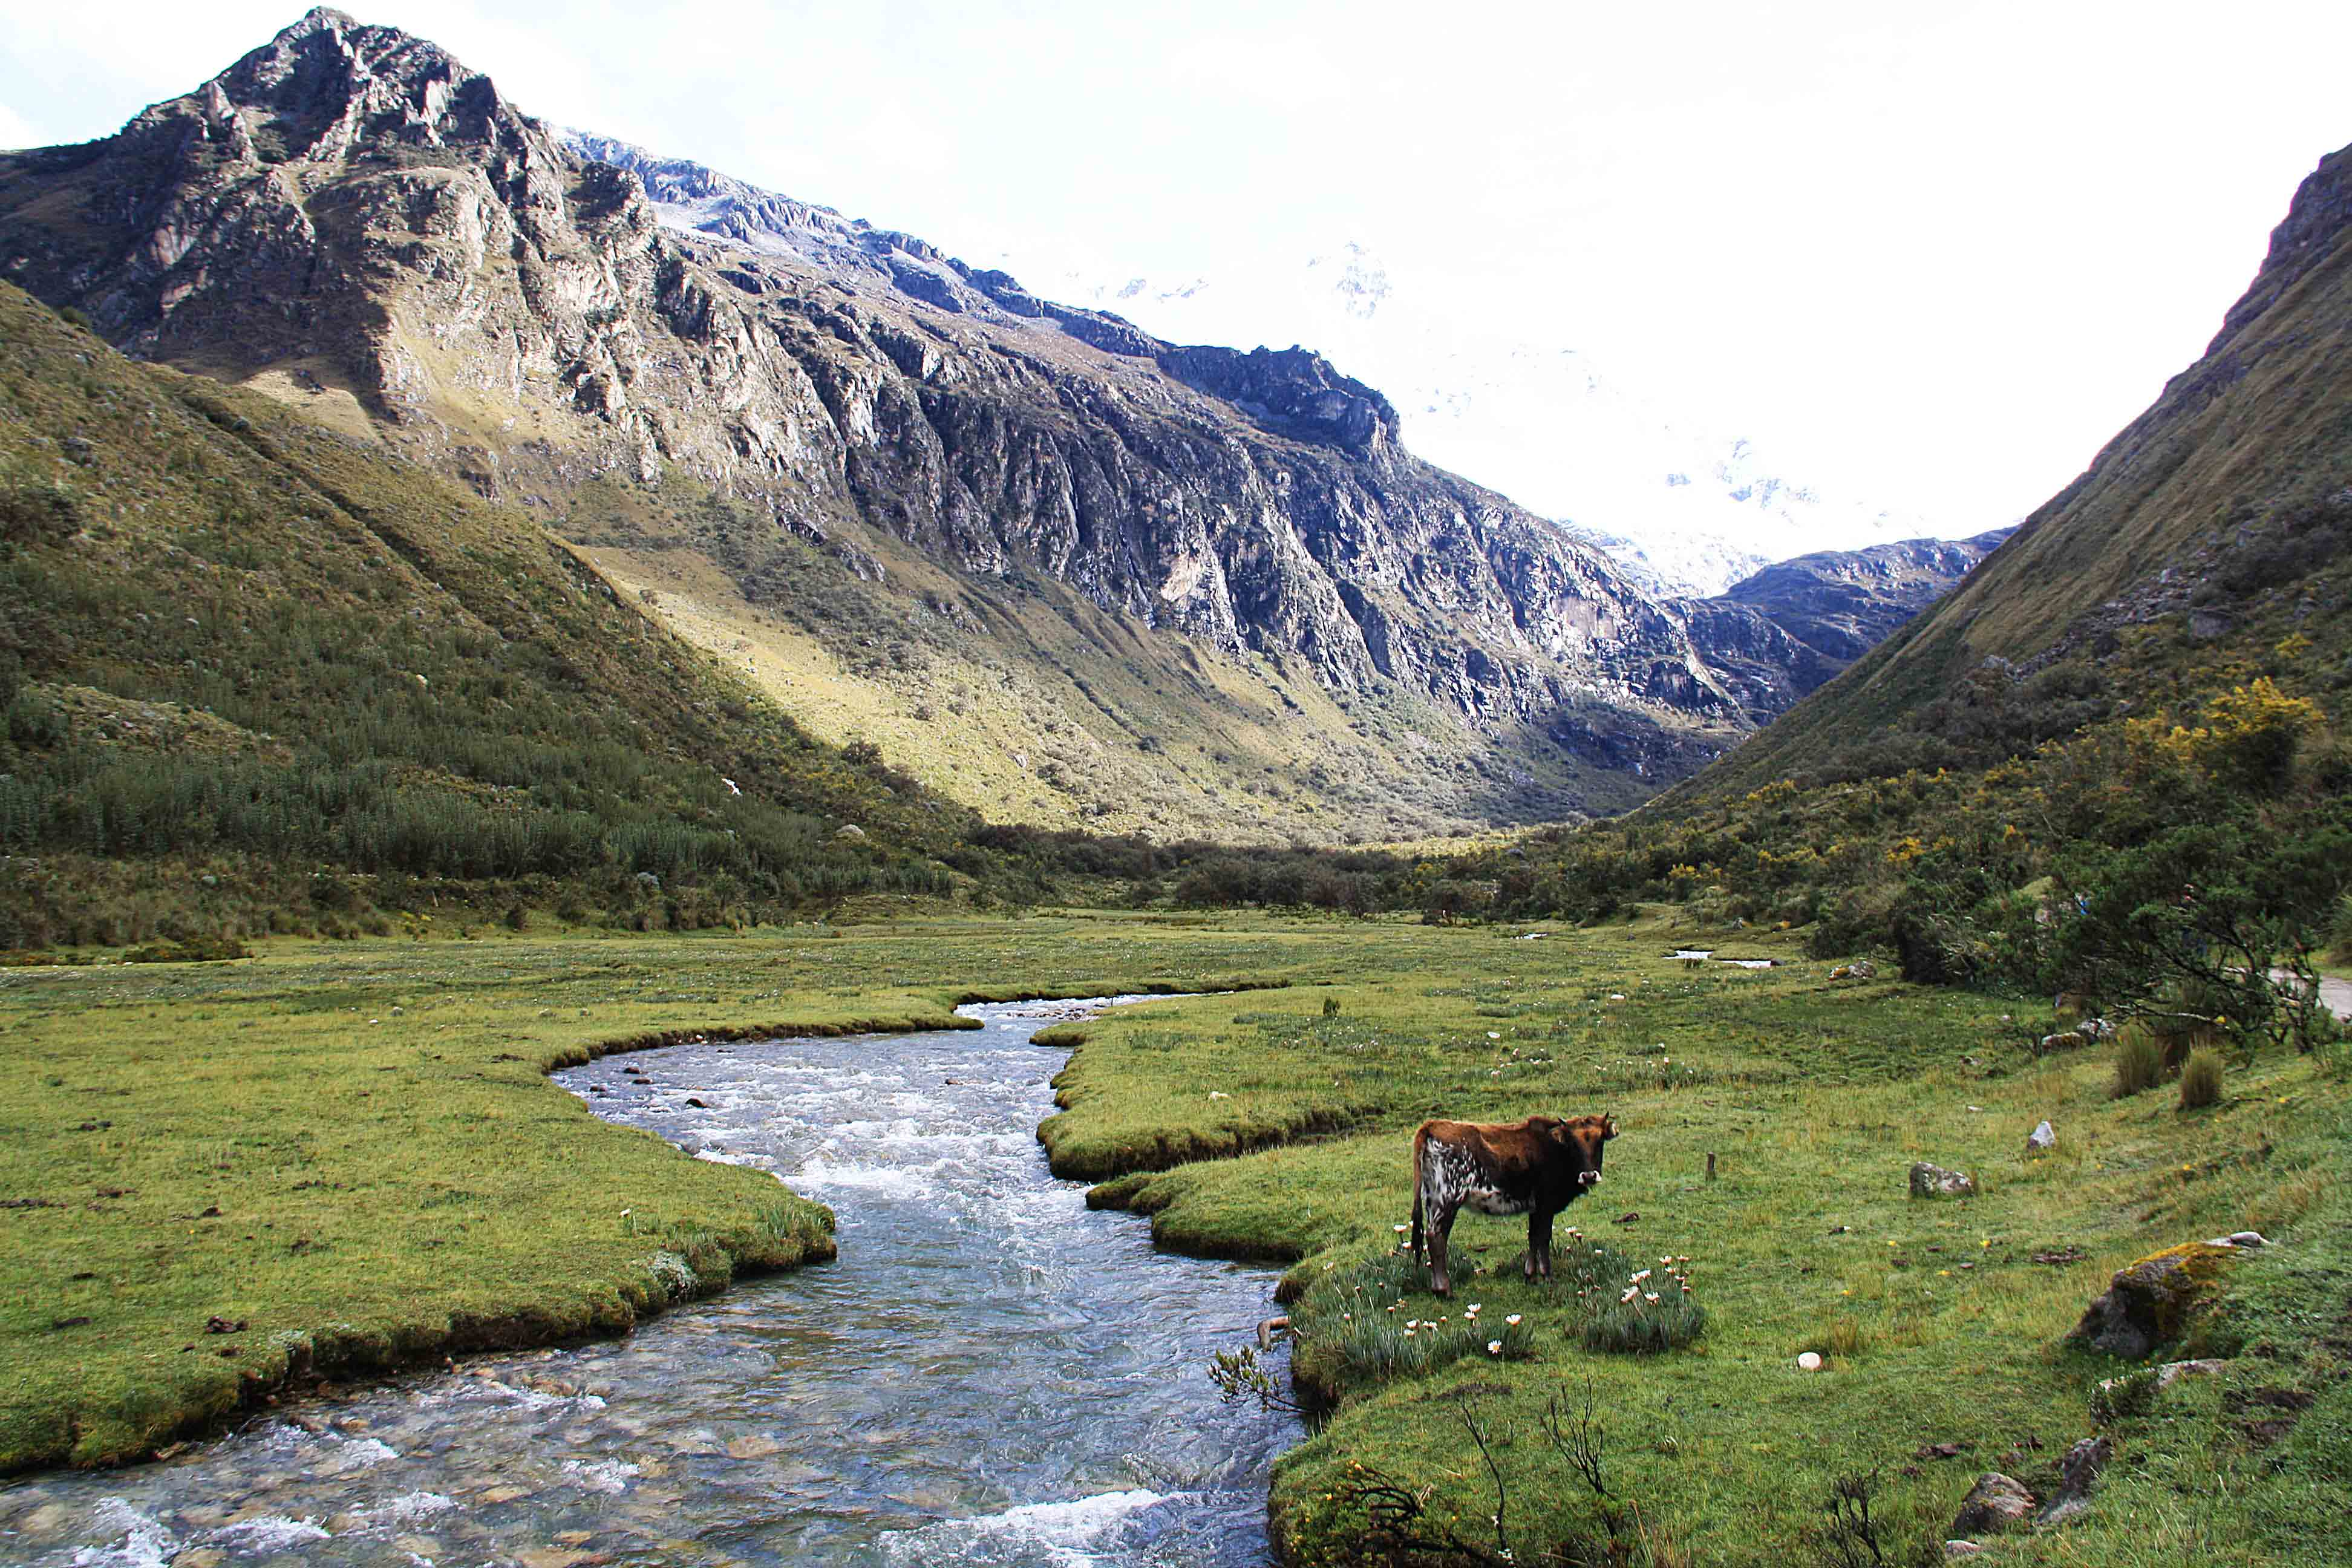 laguna 69 trekking cows view